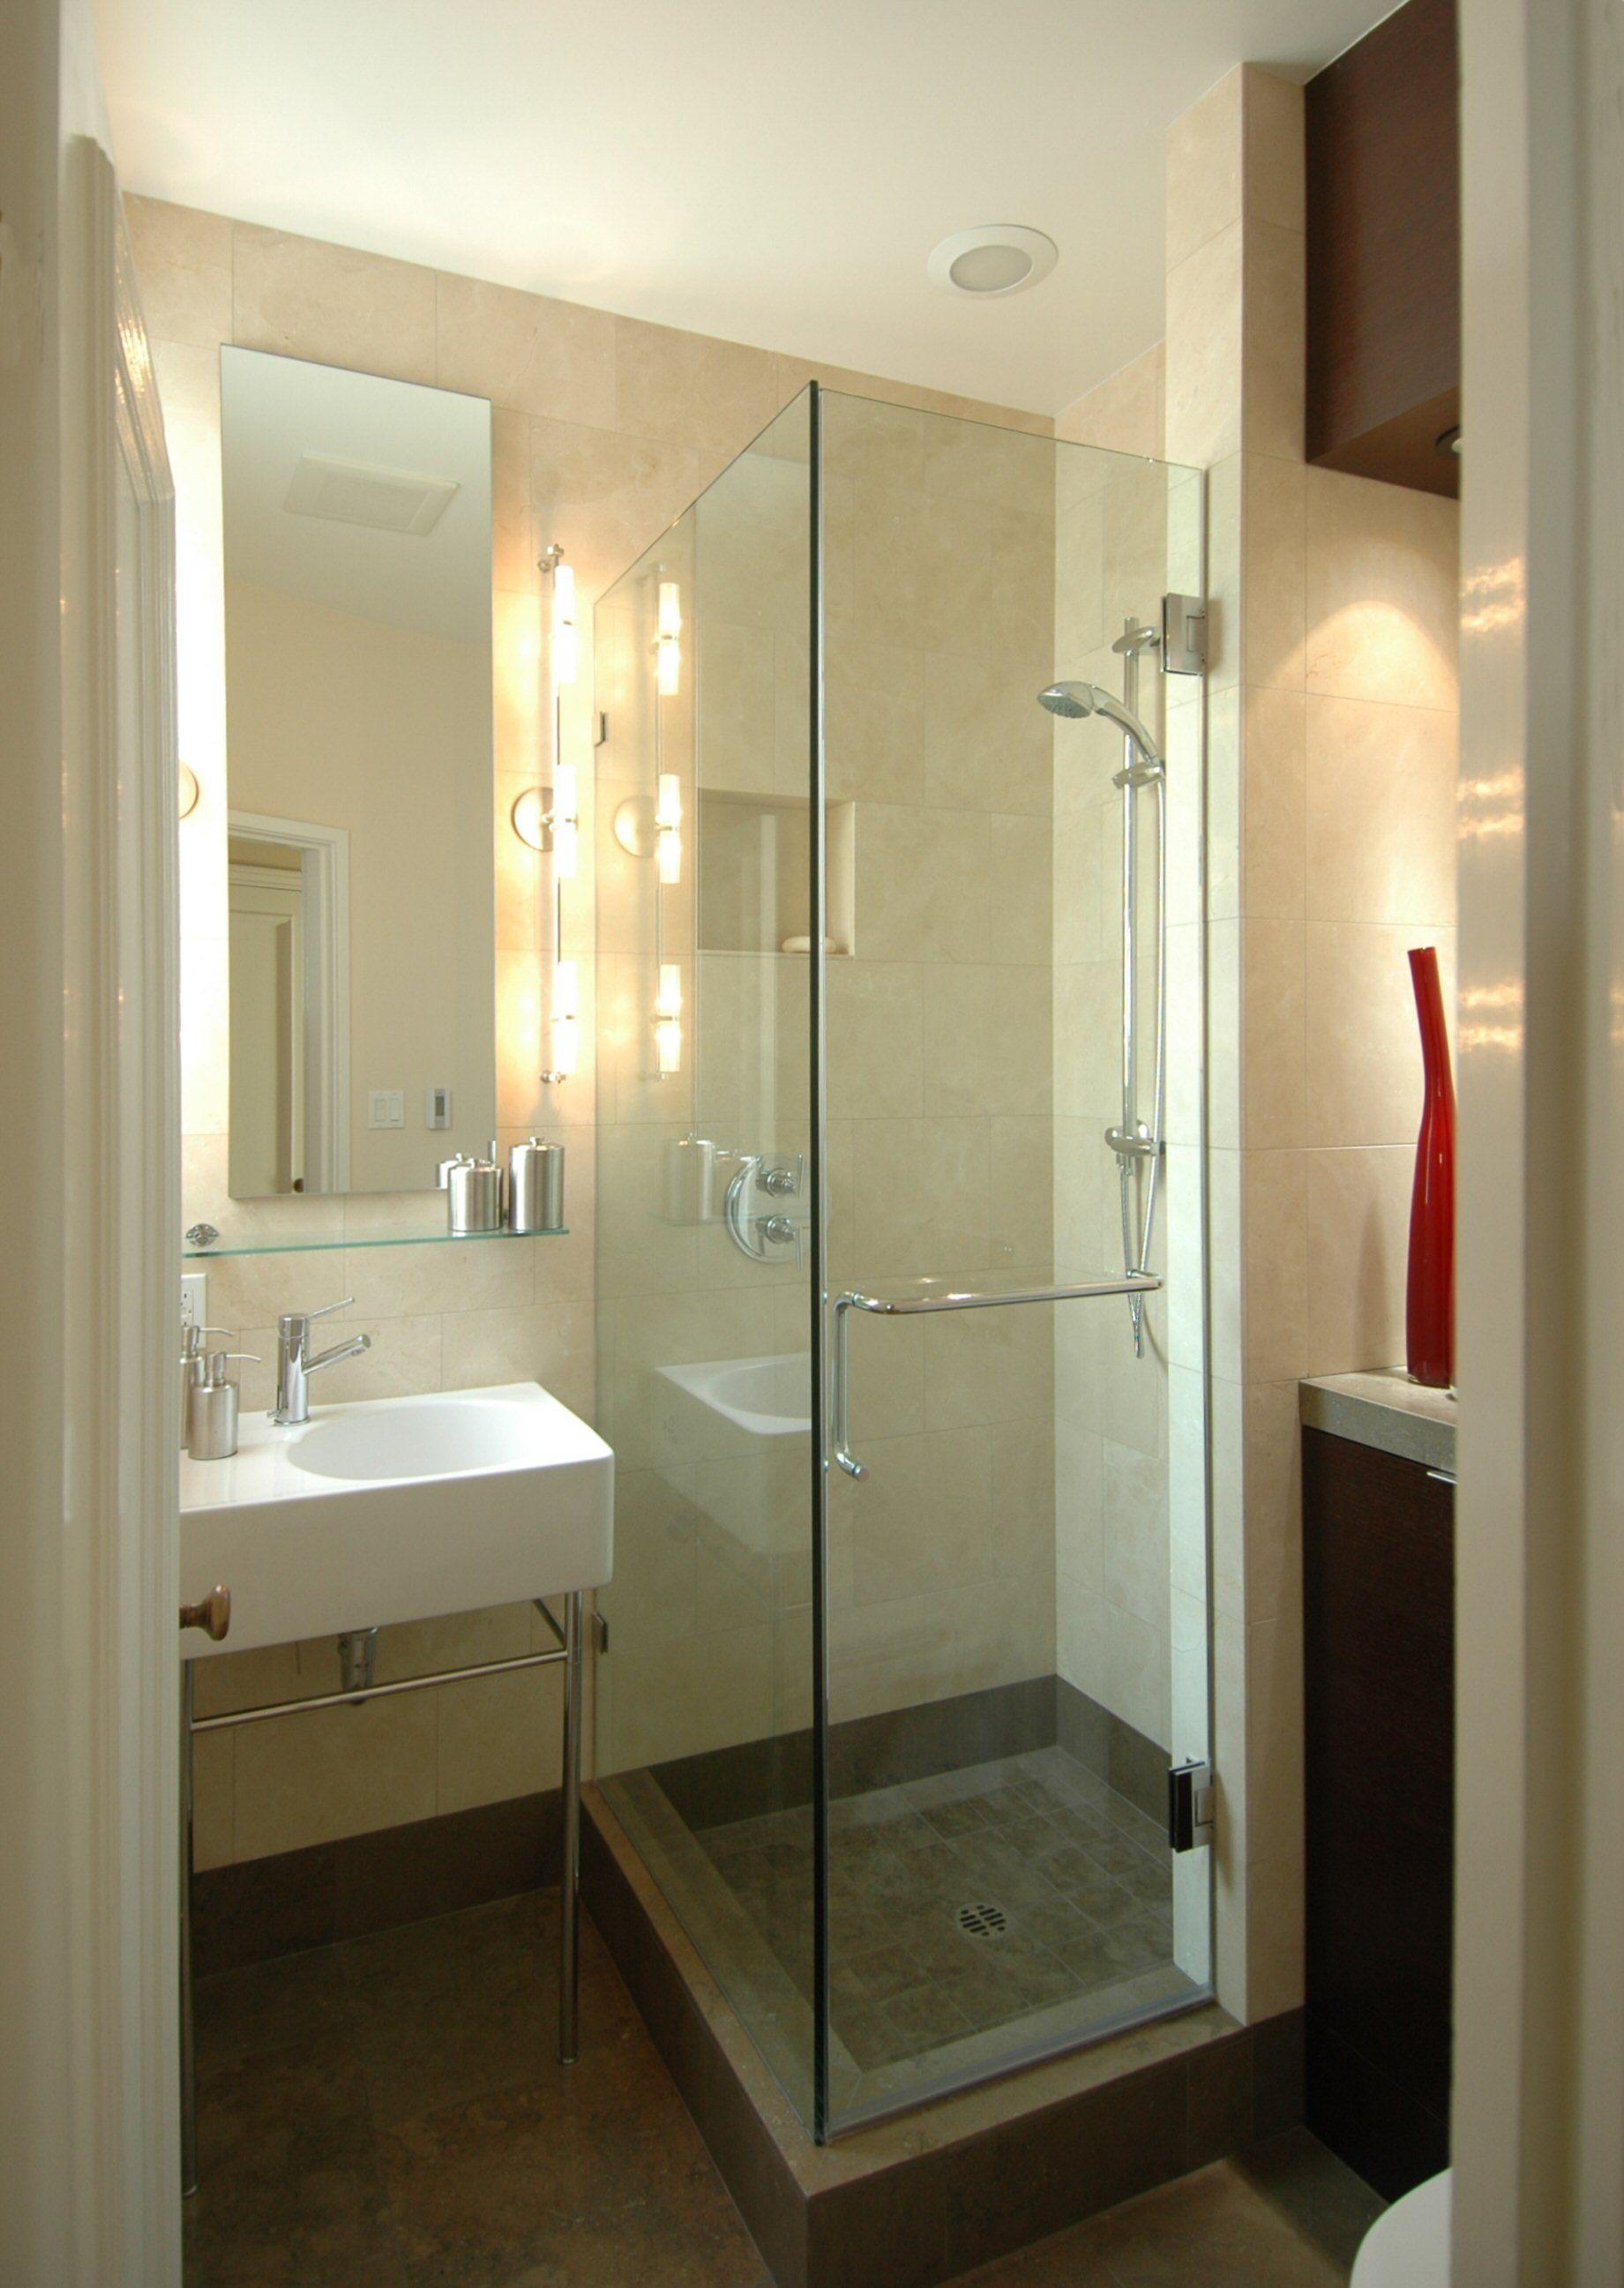 Kartinki Po Zaprosu Very Small Shower In Studio Basement Bathroom Design Bathroom Design Small Small Bathroom With Shower